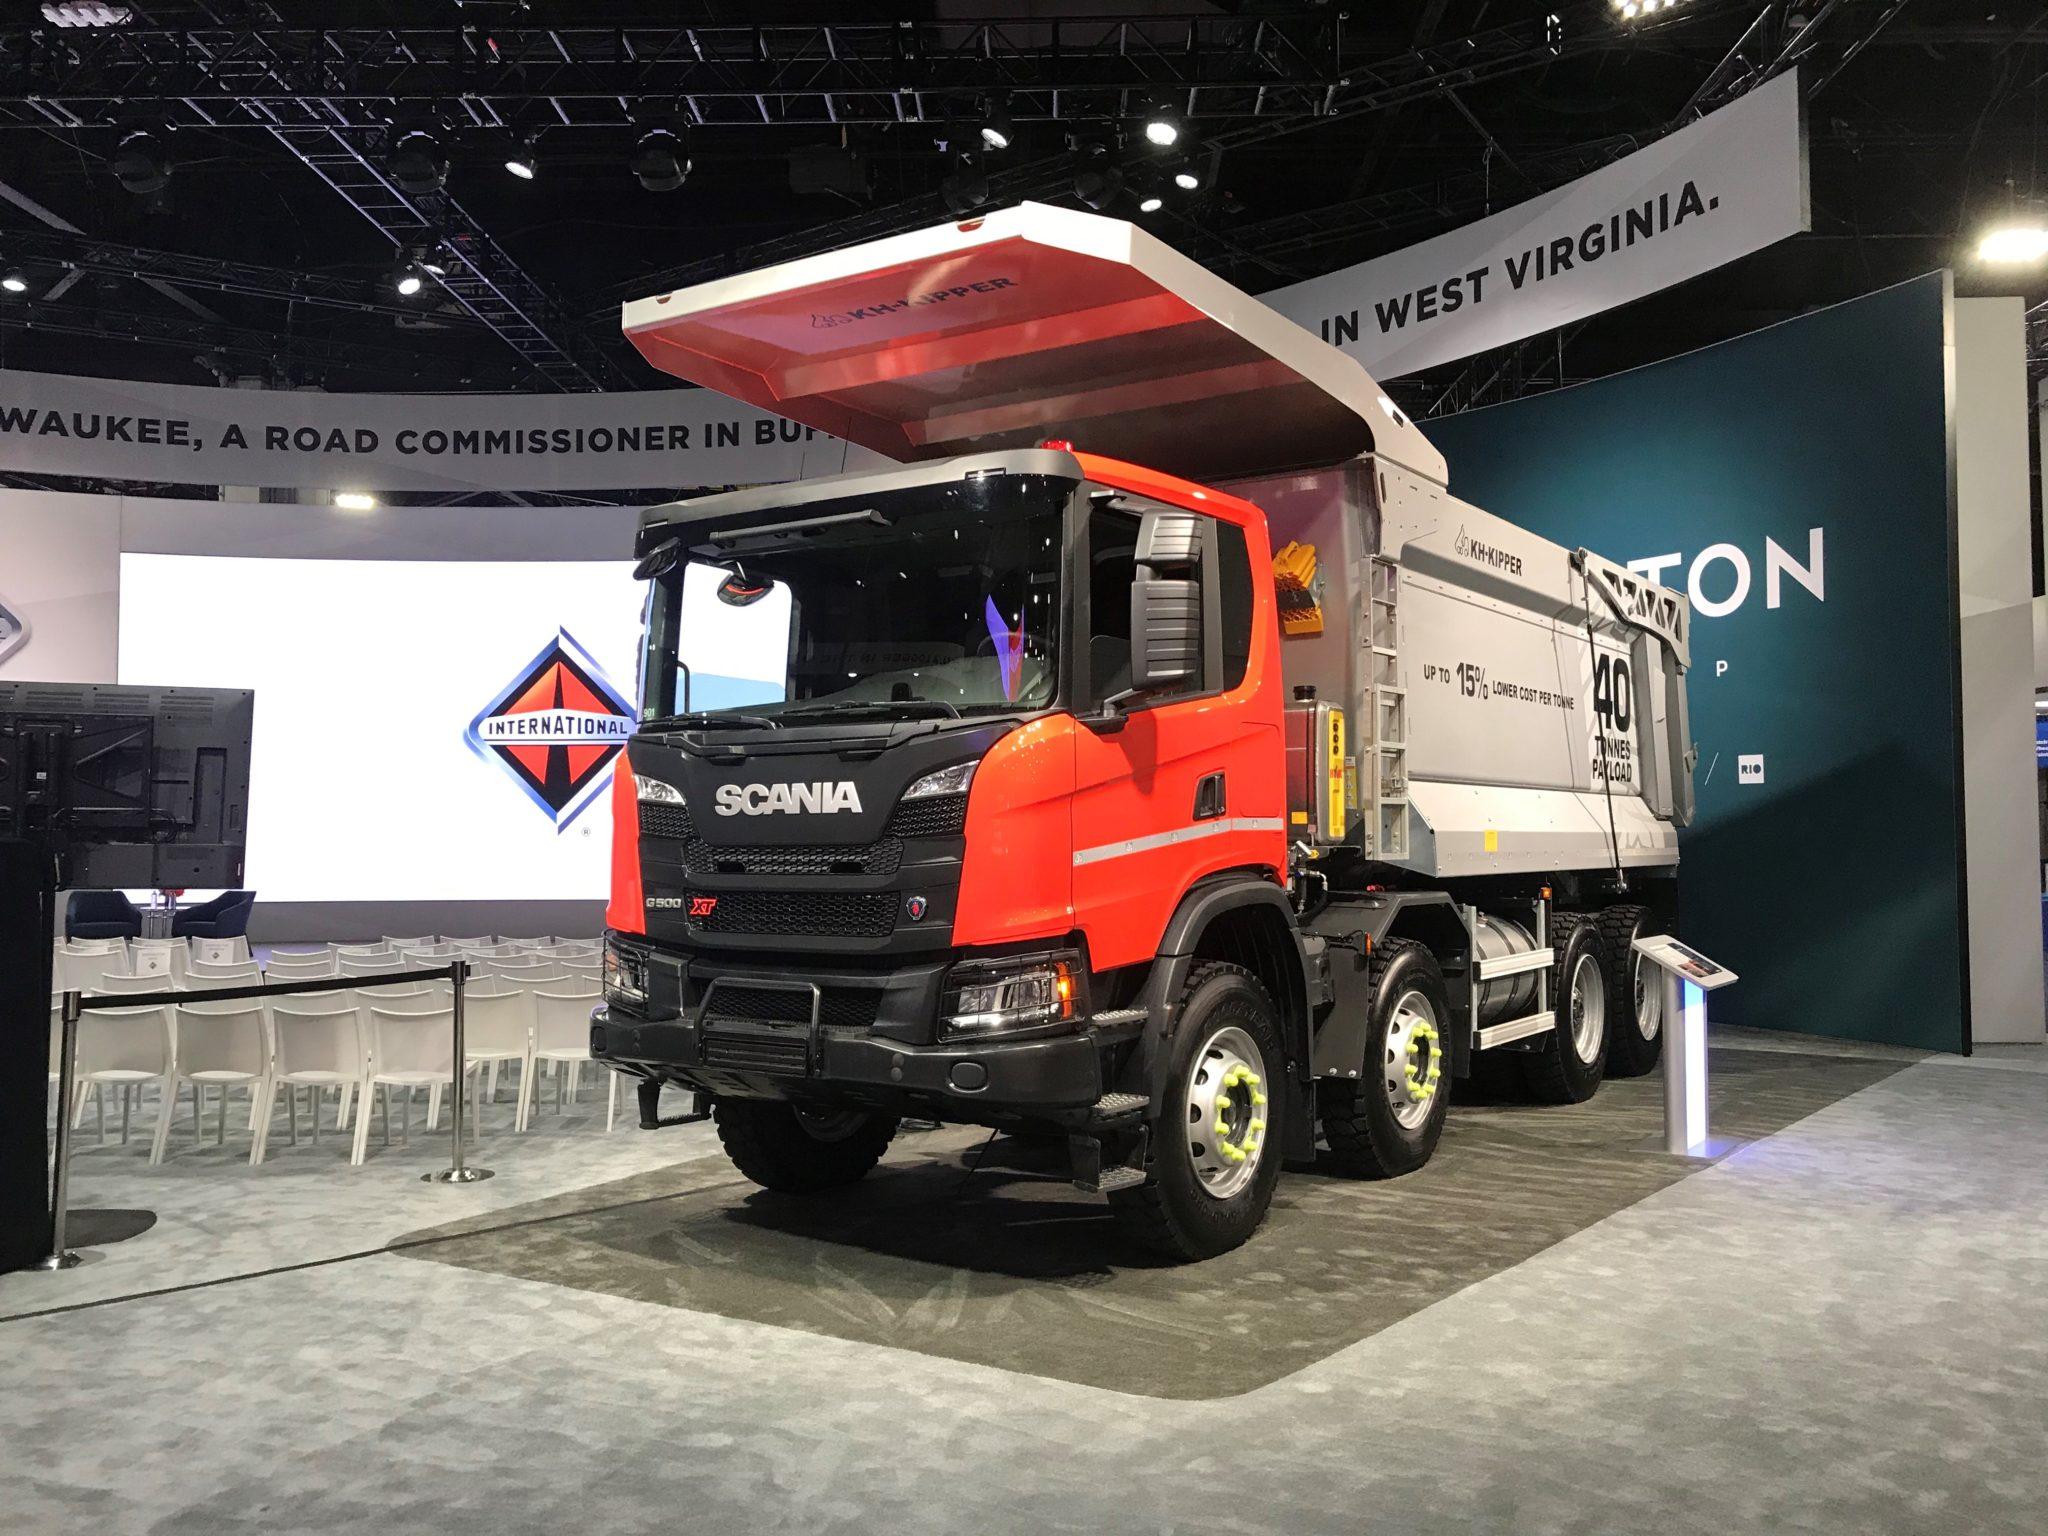 Scania/Navistar